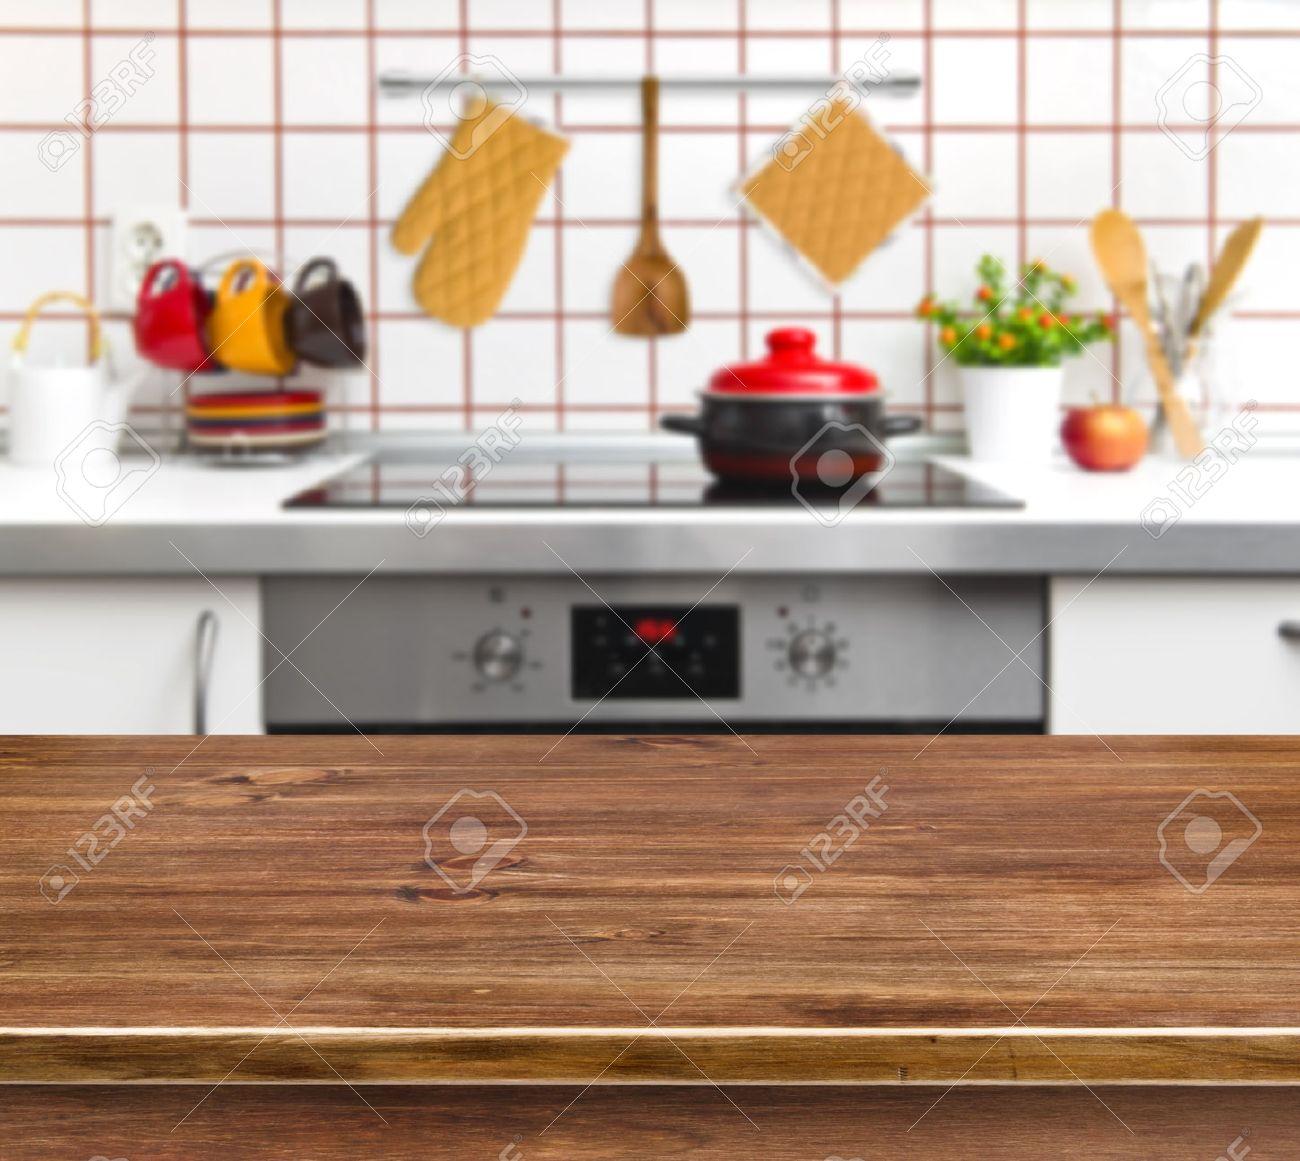 Tavolo Texture In Legno Sulla Cucina Panchina Sfondo Foto Royalty ...